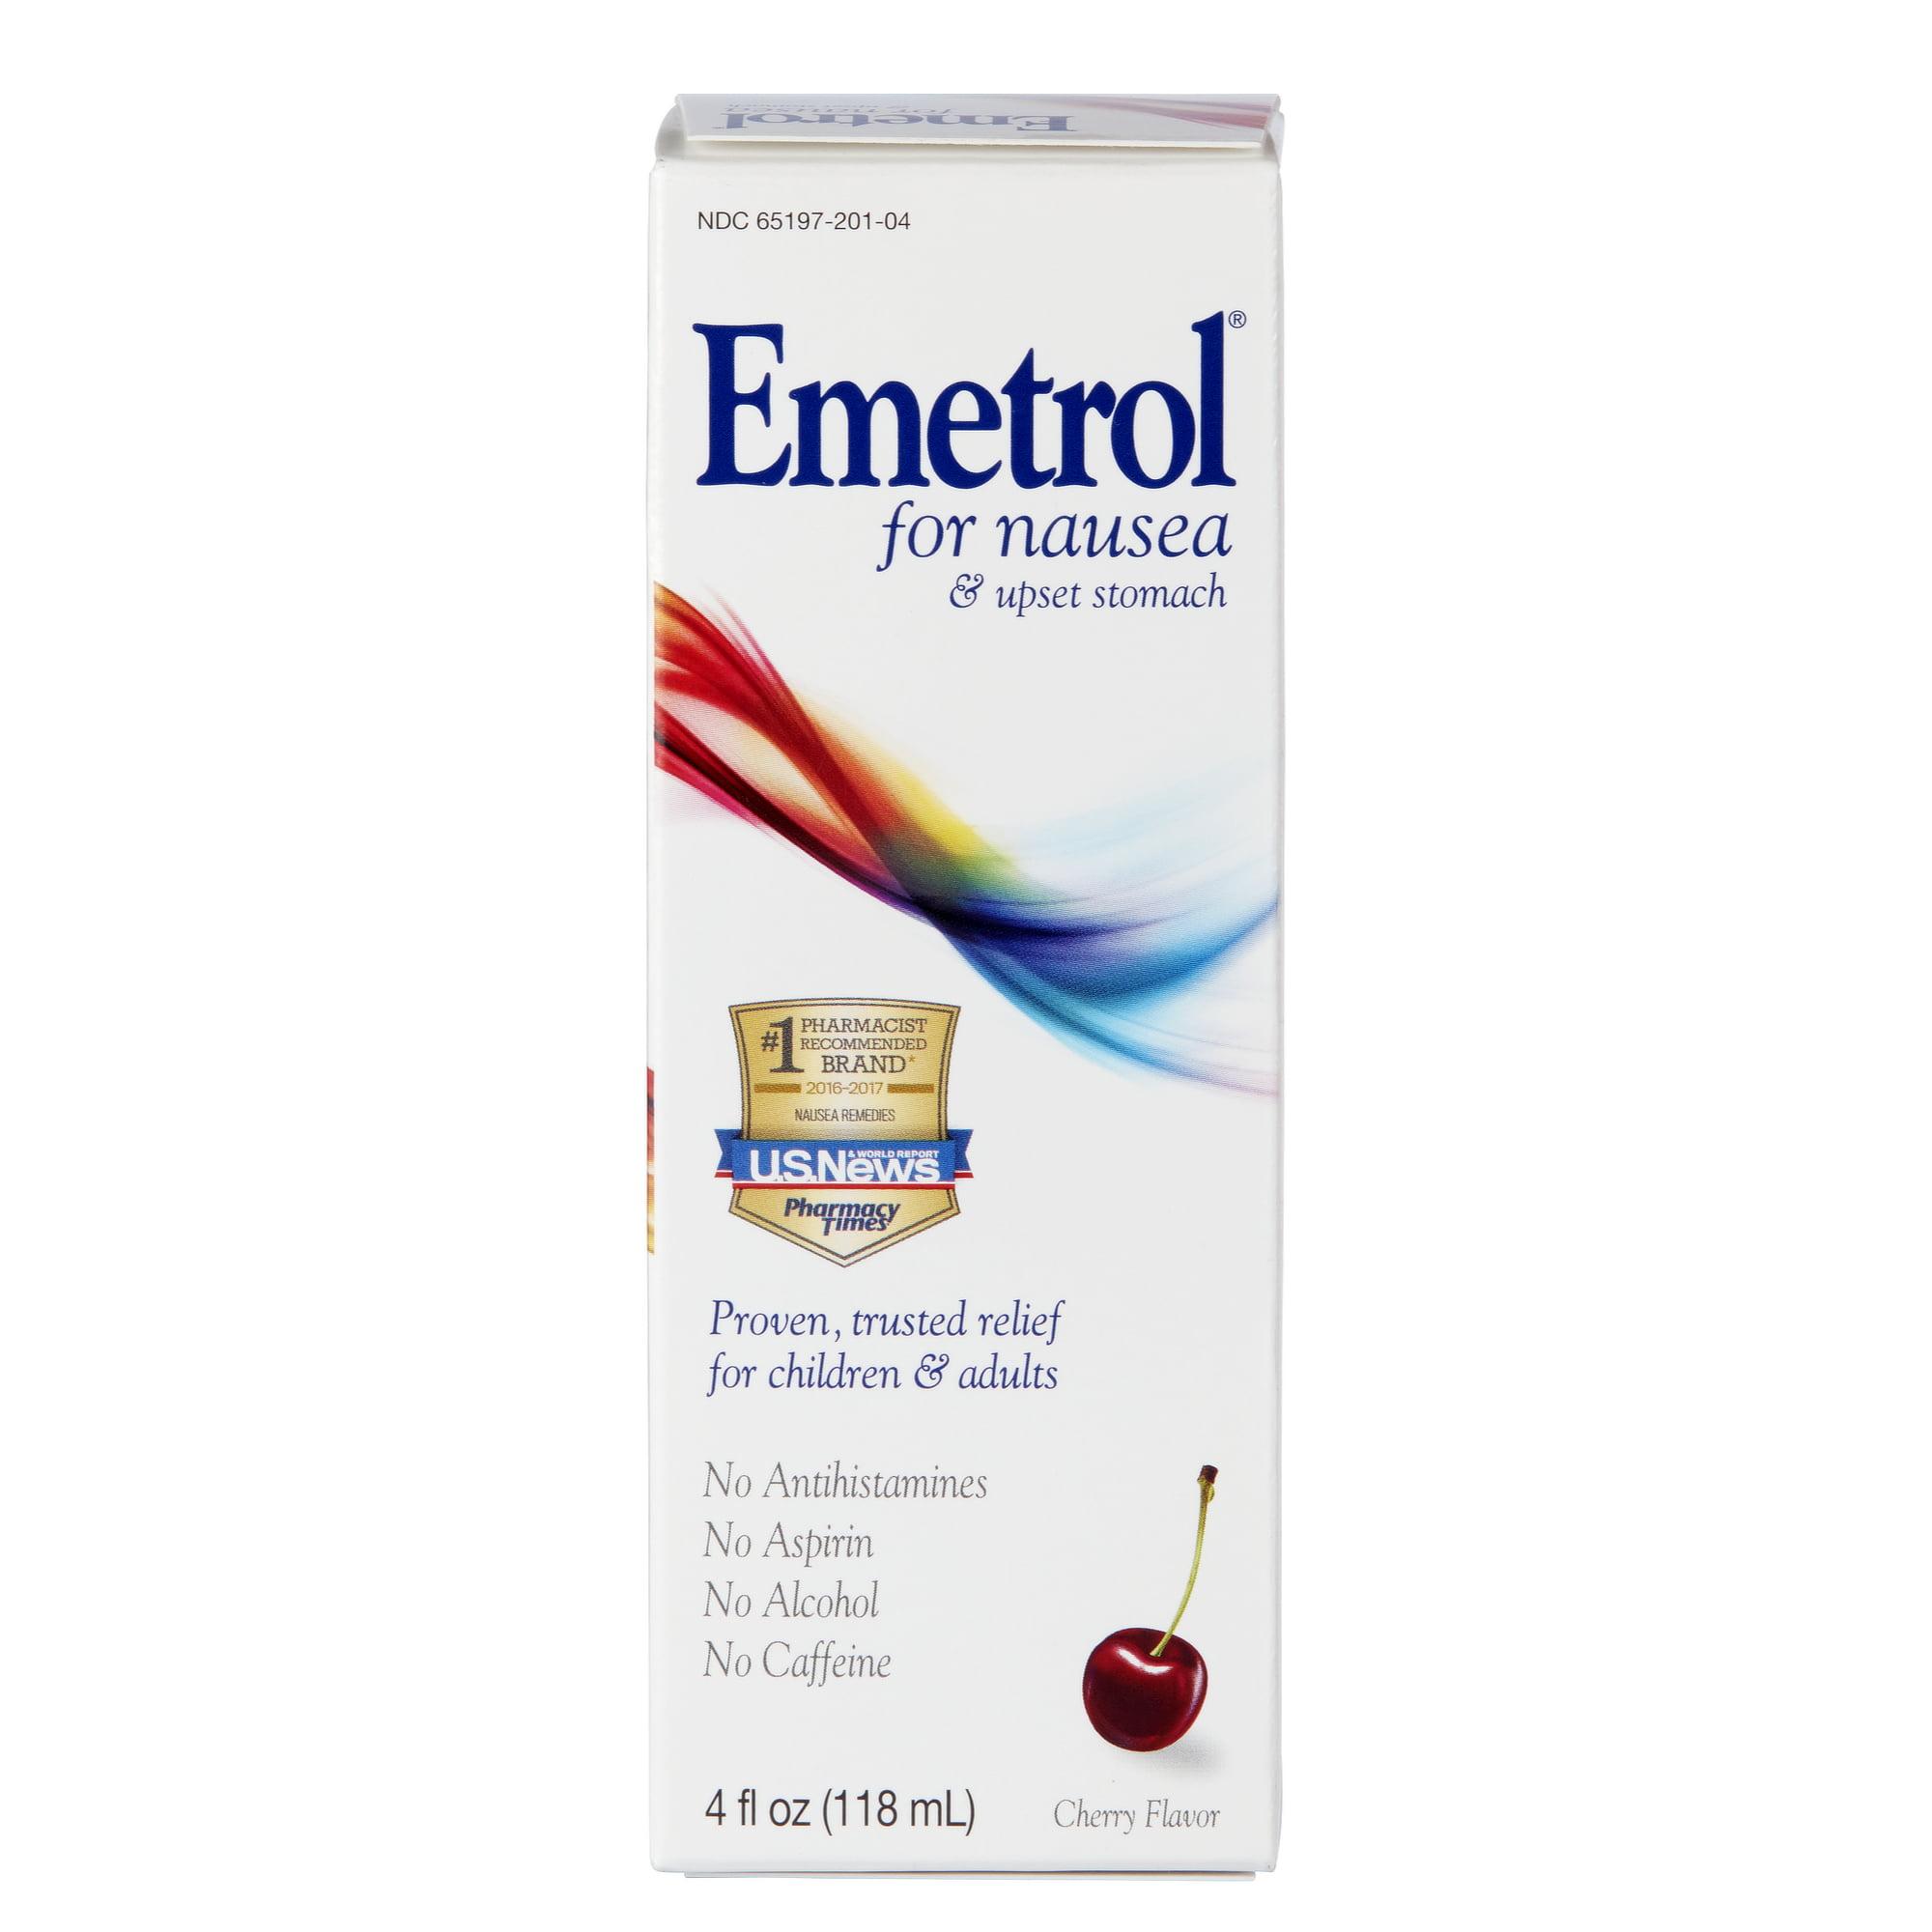 Emetrol Nausea and Upset Stomach Relief Liquid Medication